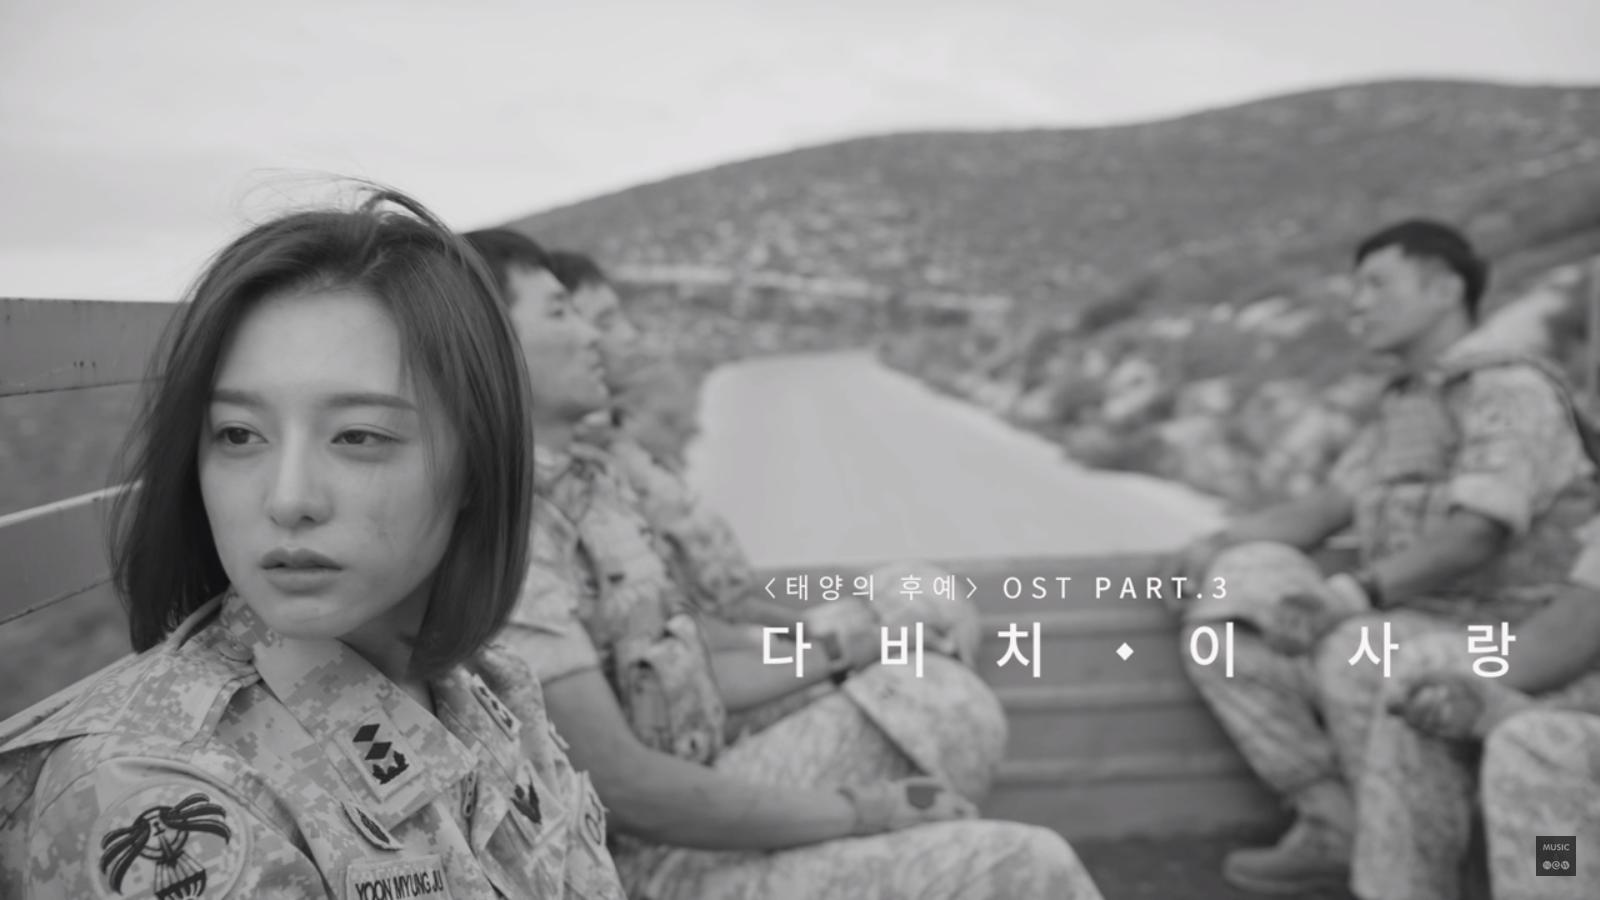 《太陽的後裔》第三波OST-Davichi演唱【This Love】